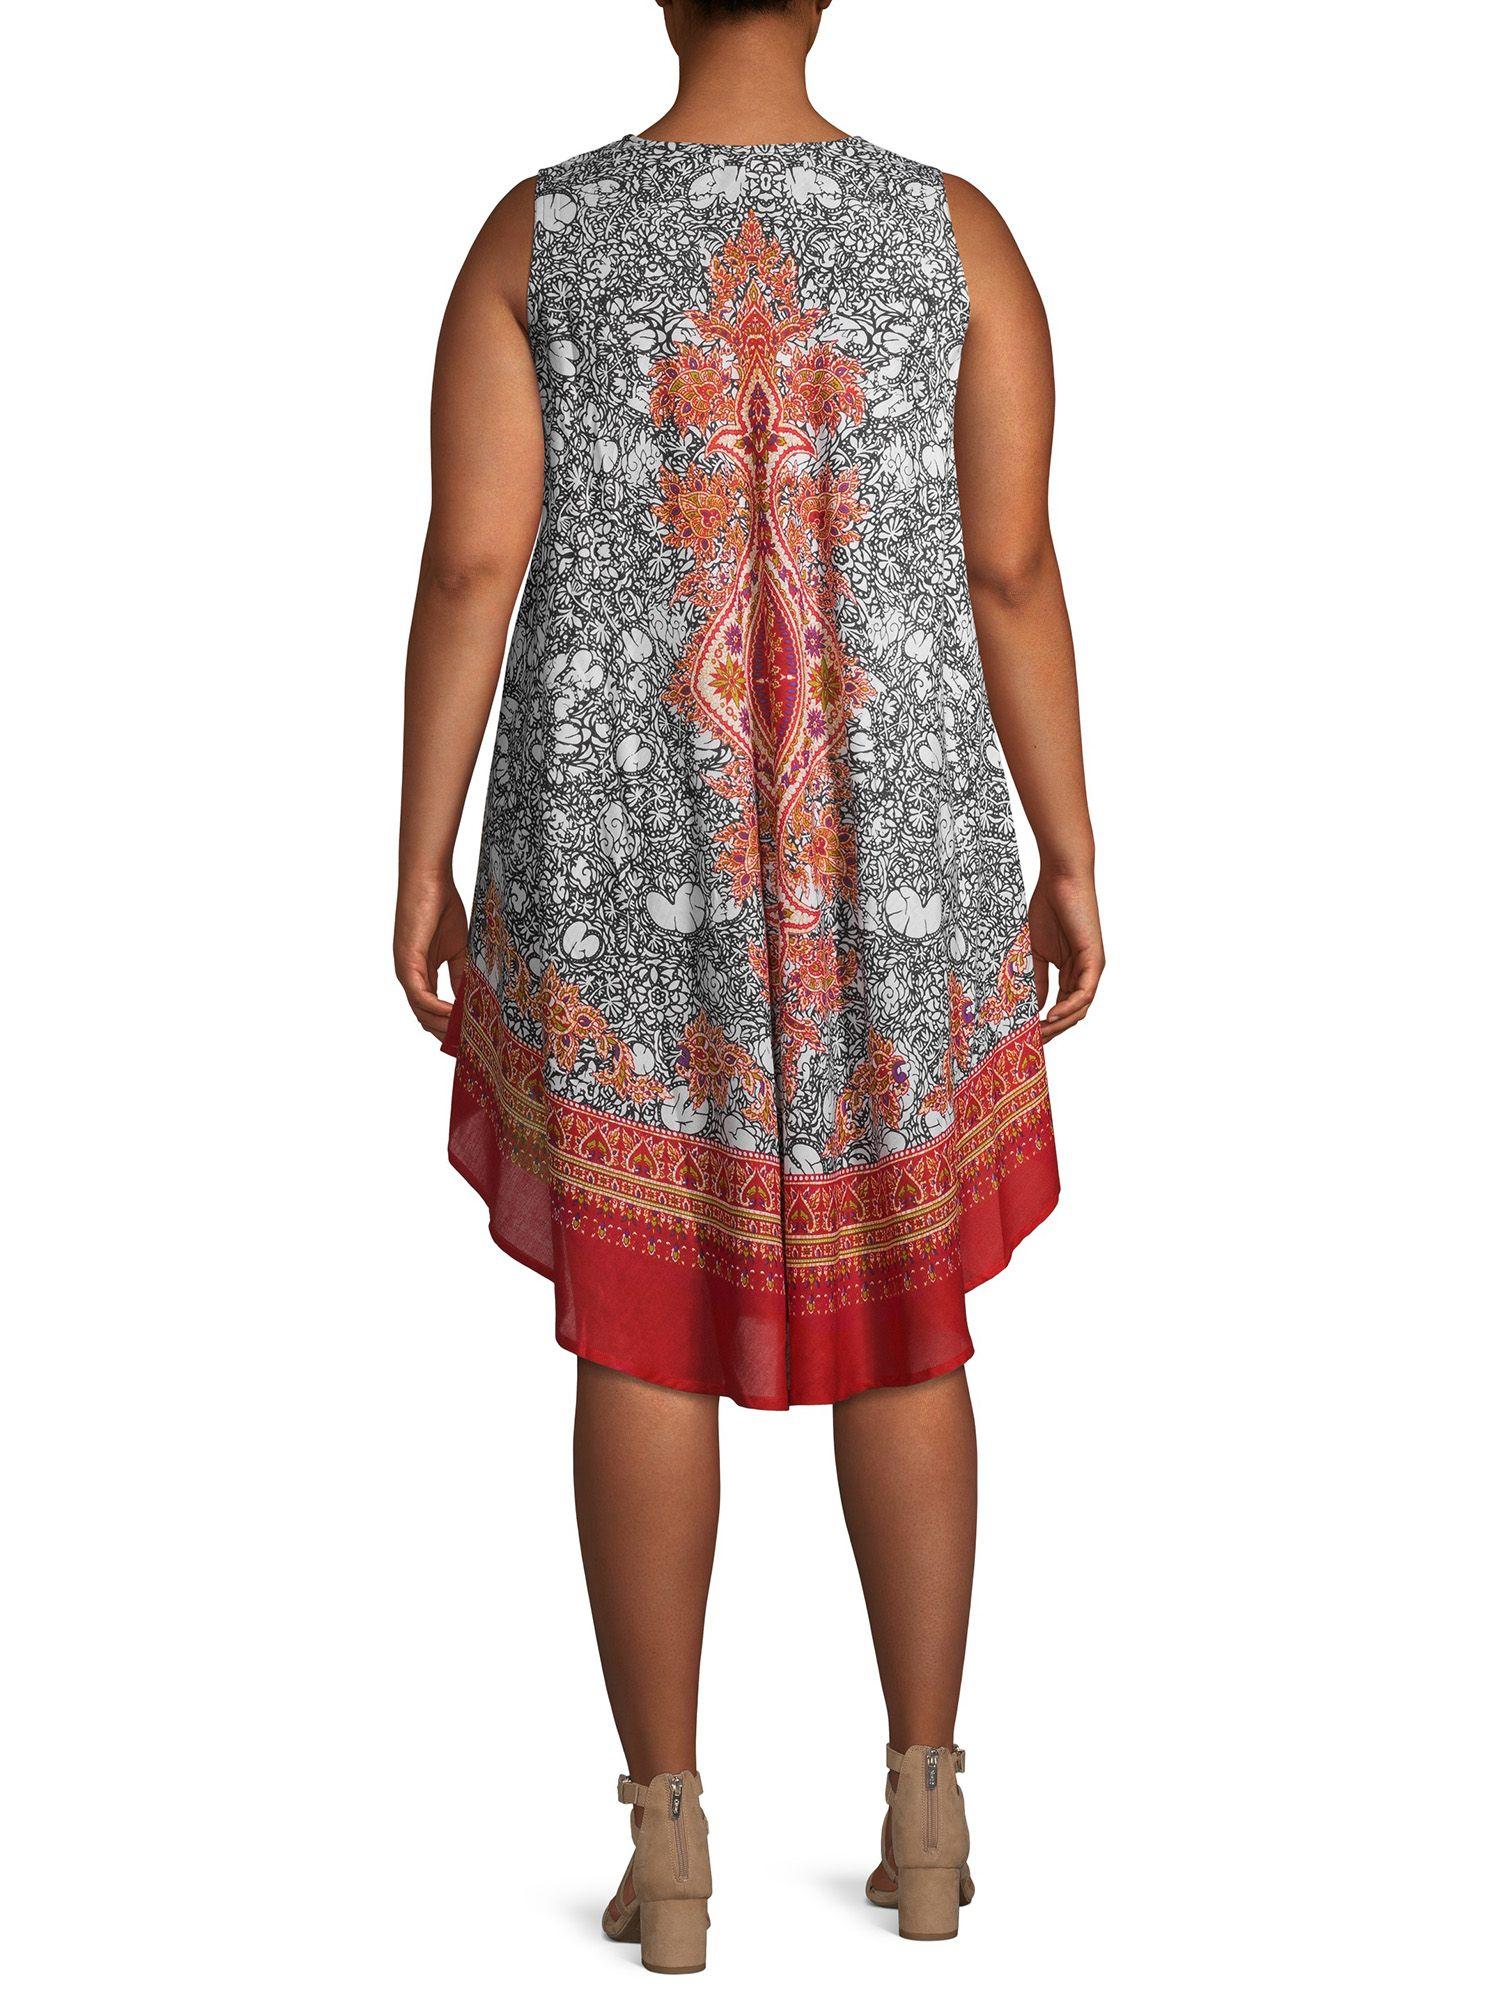 Studio West Studio West Women S Plus Size Medallion Printed Umbrella Dress Walmart Com Umbrella Dress Dresses Print Umbrella [ 2000 x 1500 Pixel ]